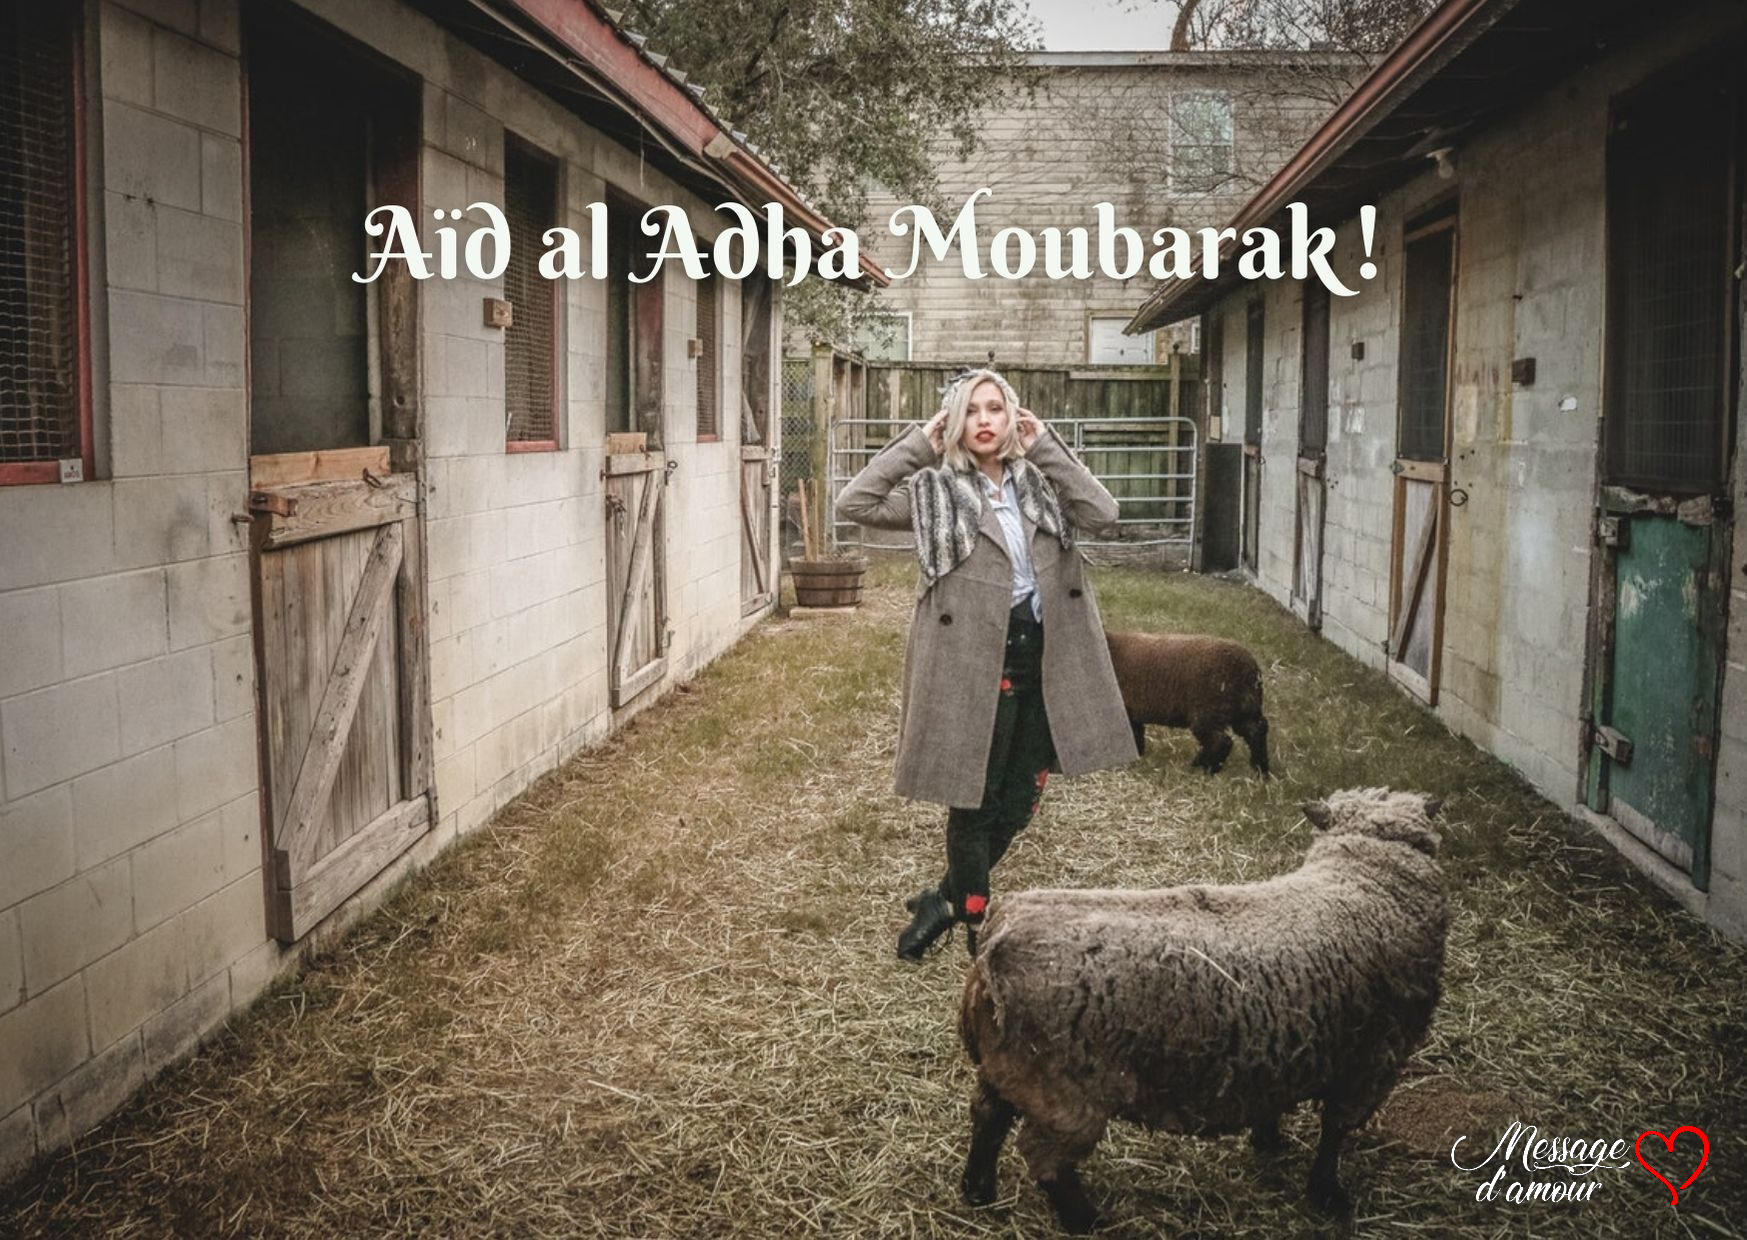 Aid al adha moubarek photo